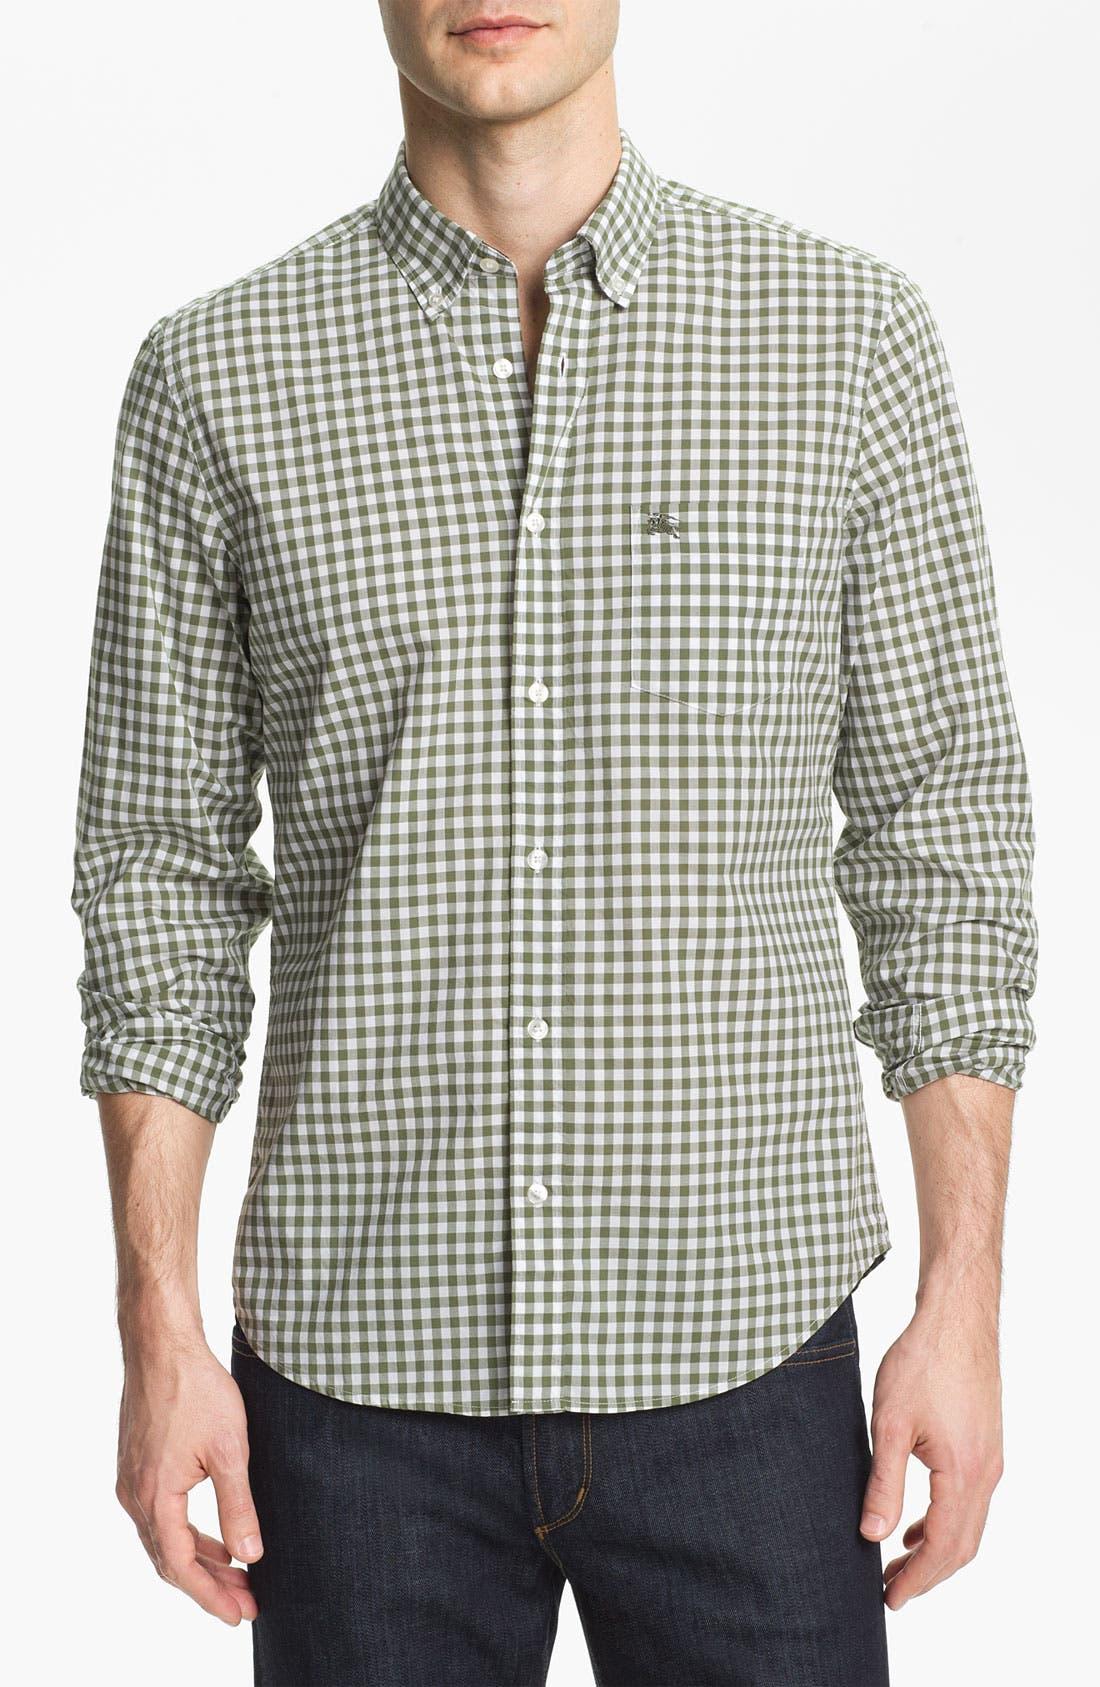 Alternate Image 1 Selected - Burberry Brit Gingham Check Sport Shirt